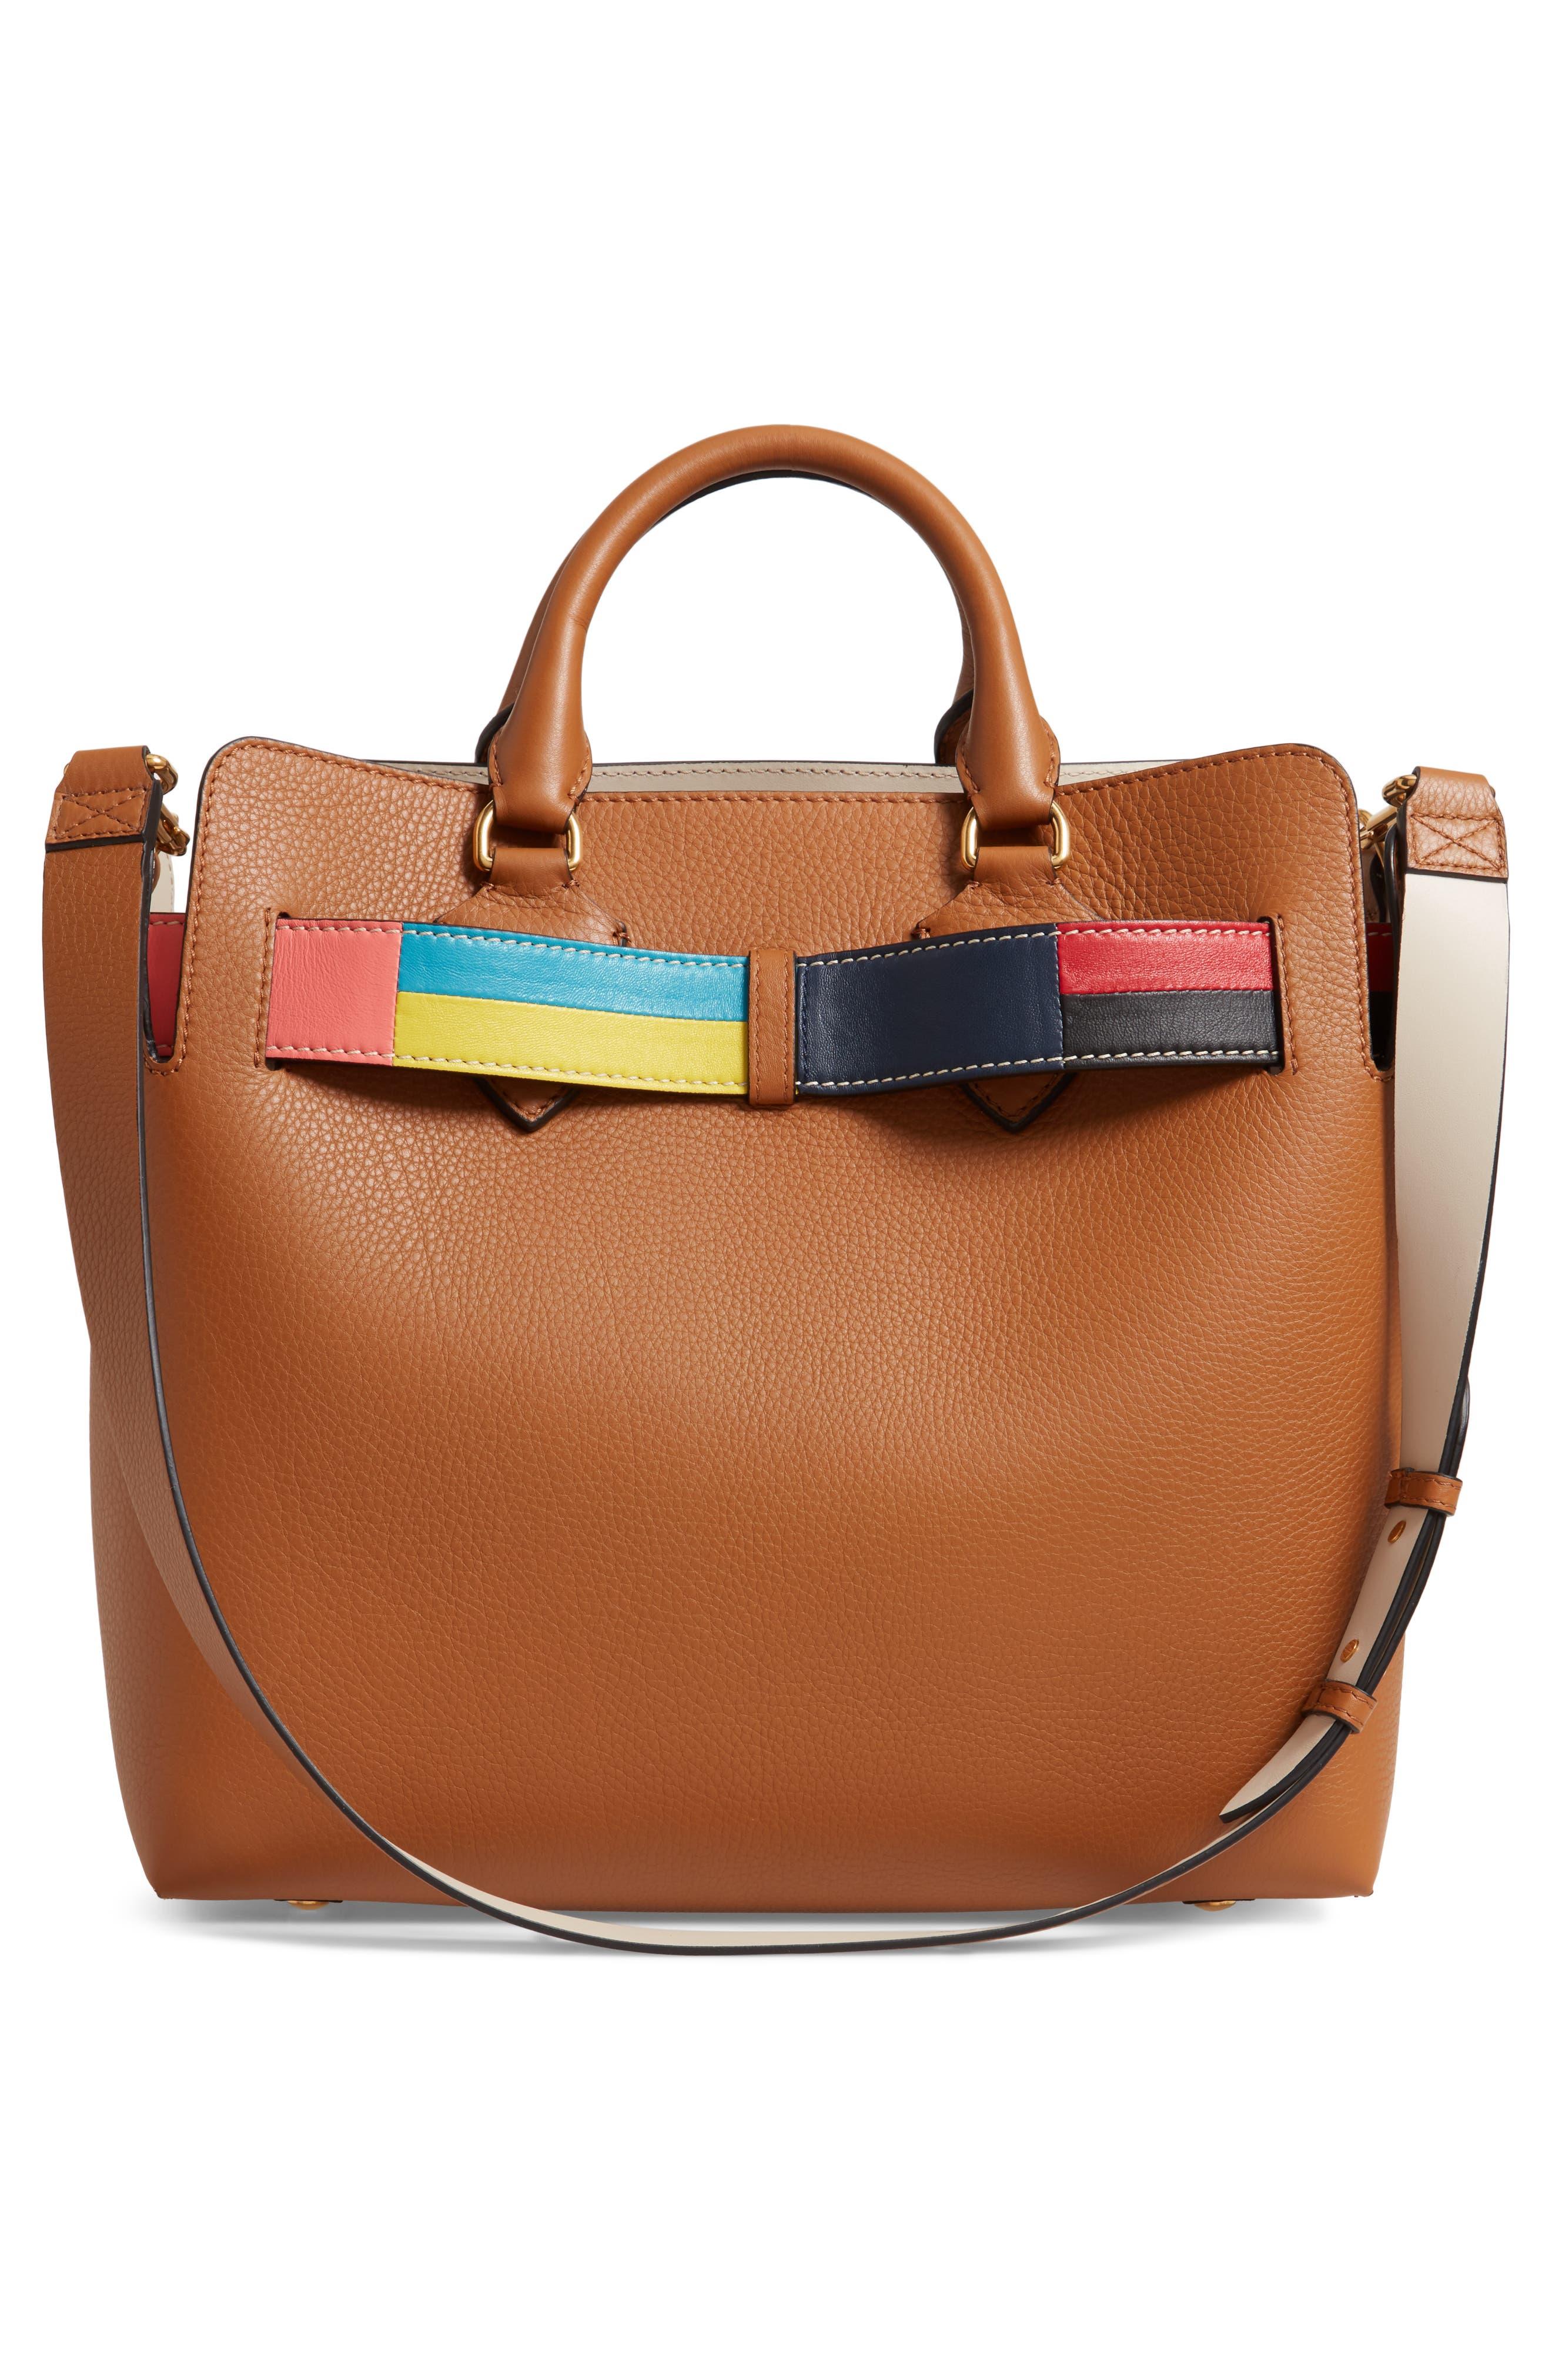 Medium Belt Bag Leather Tote,                             Alternate thumbnail 3, color,                             COGNAC